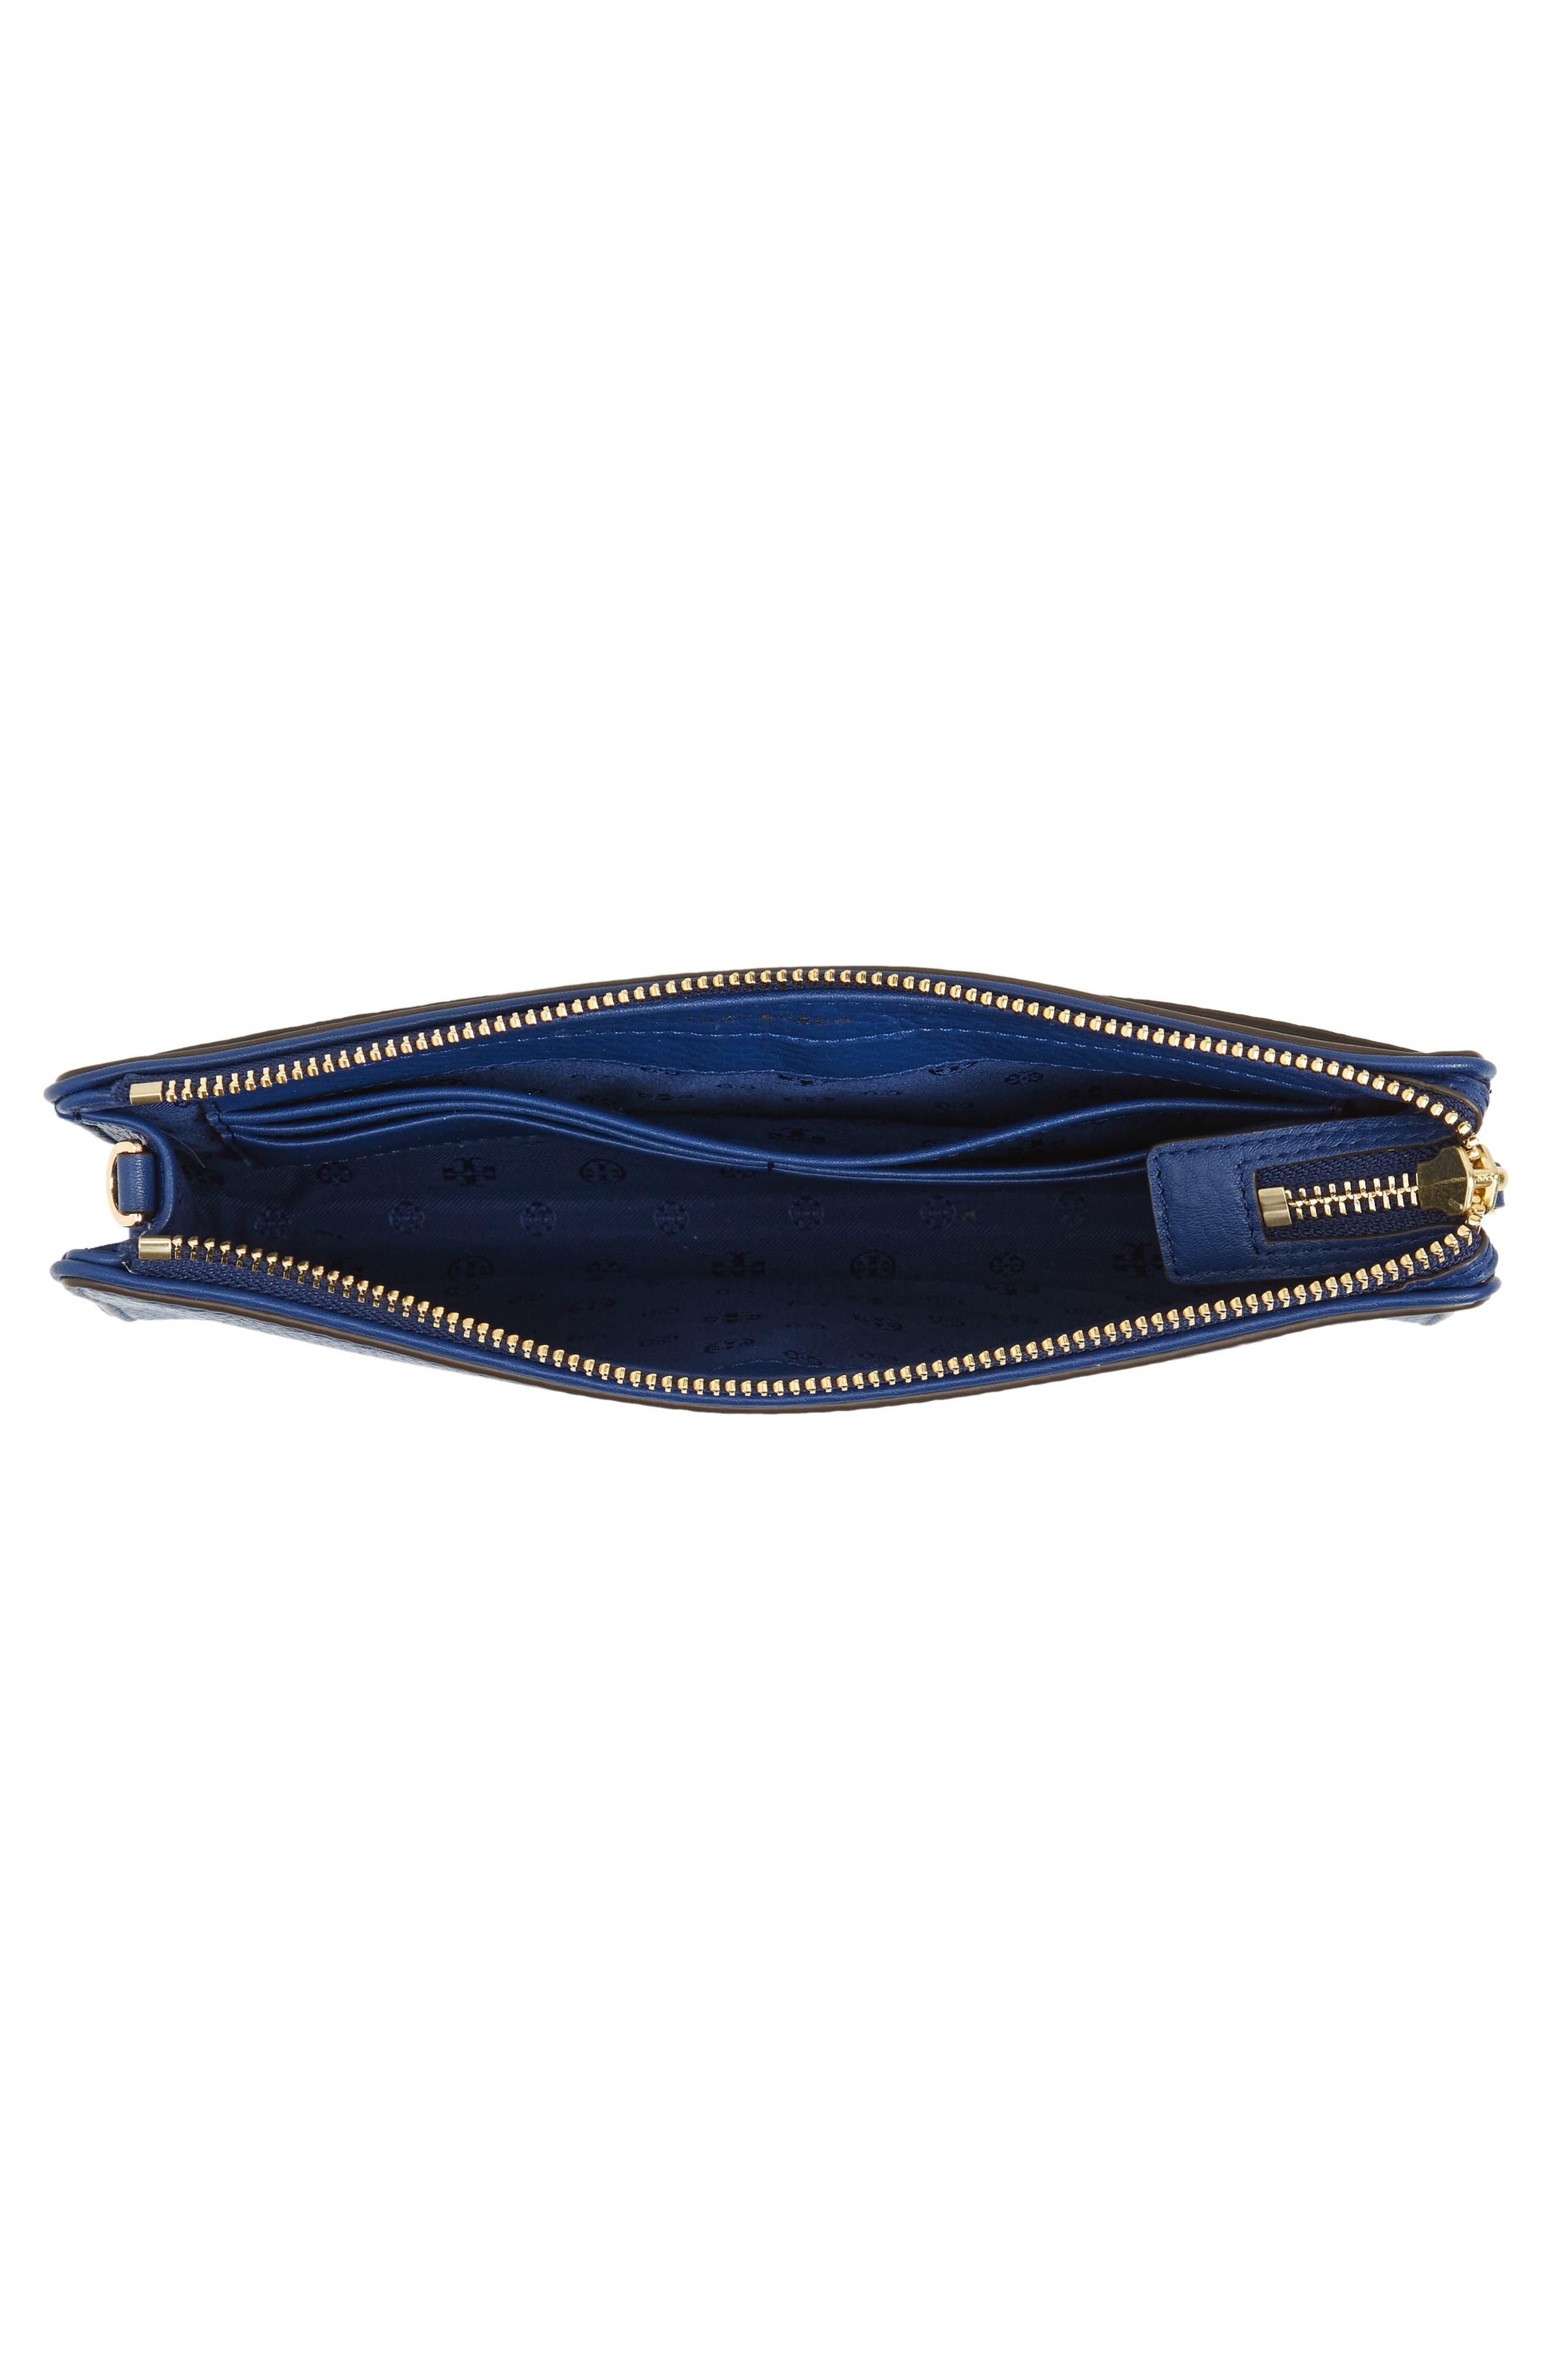 Marsden Leather Wallet Crossbody Bag,                             Alternate thumbnail 4, color,                             FRESH BLUEBERRY